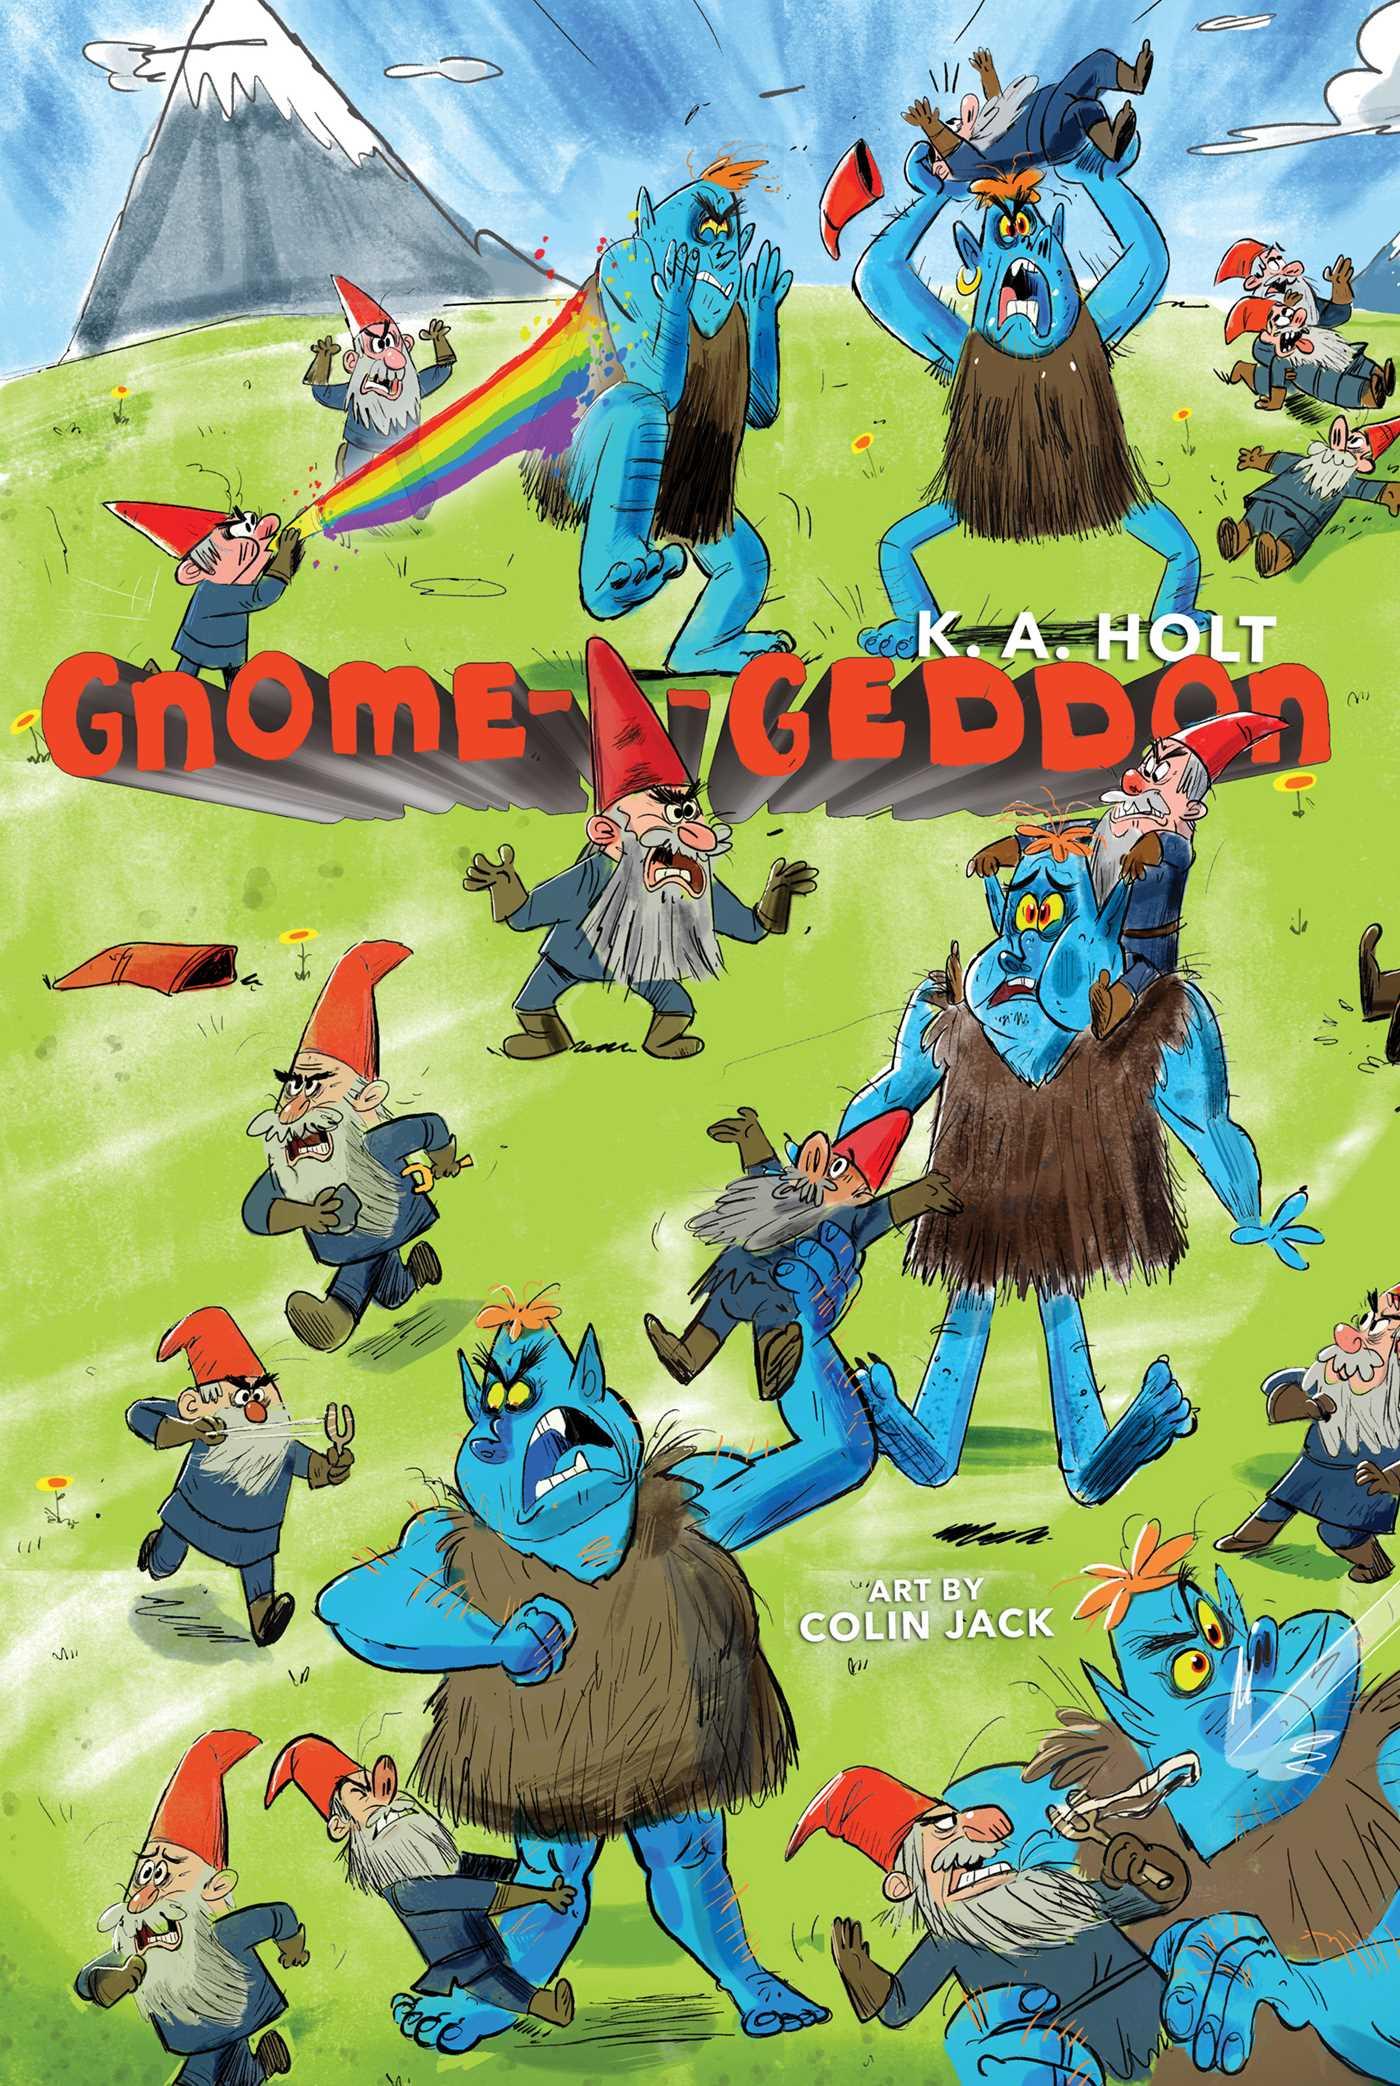 Gnome a geddon 9781481478465 hr